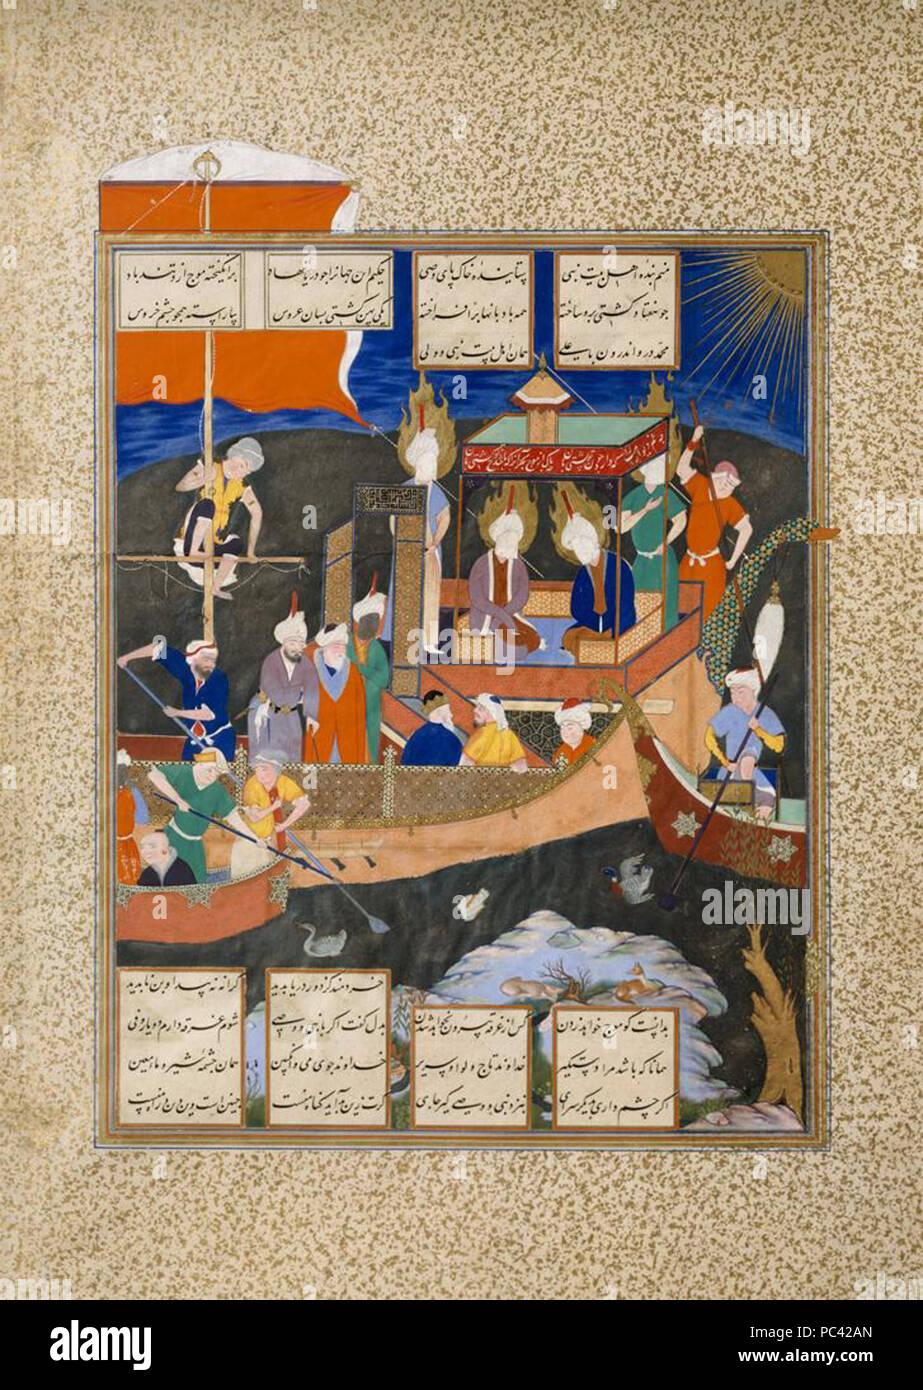 554 Shahnama of Shah Tahmasp - Stock Image